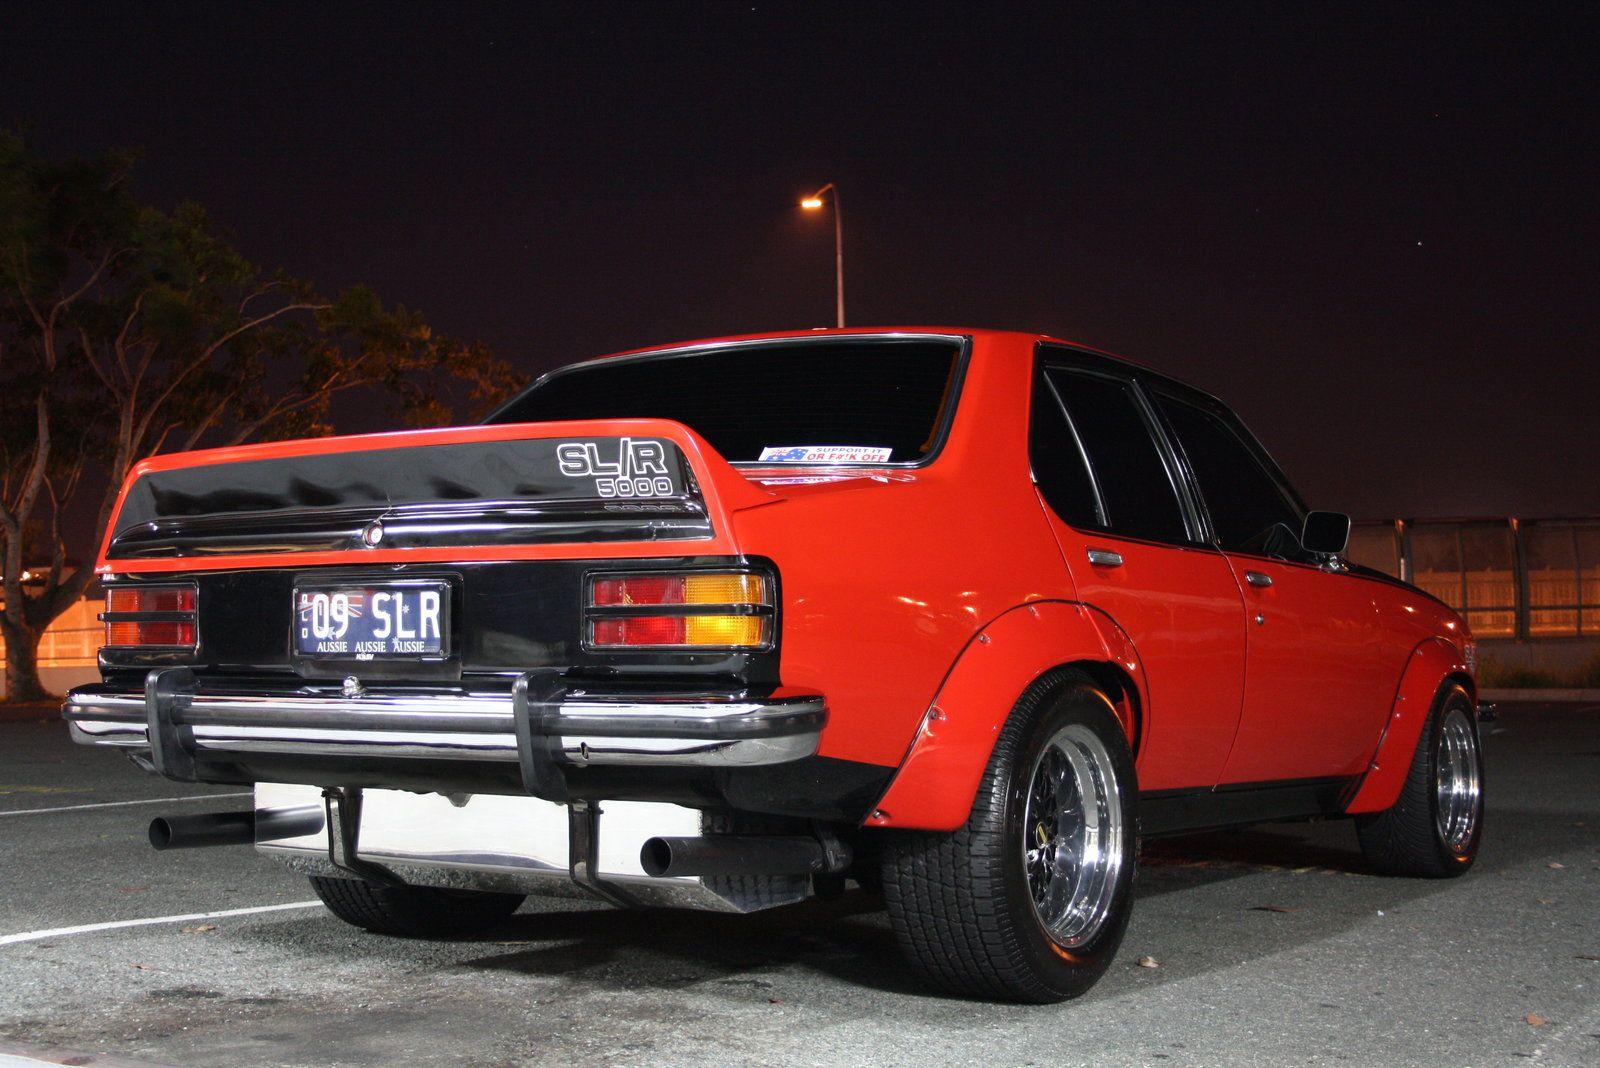 Holden Torana SLR (Australian Muscle) Holden muscle cars